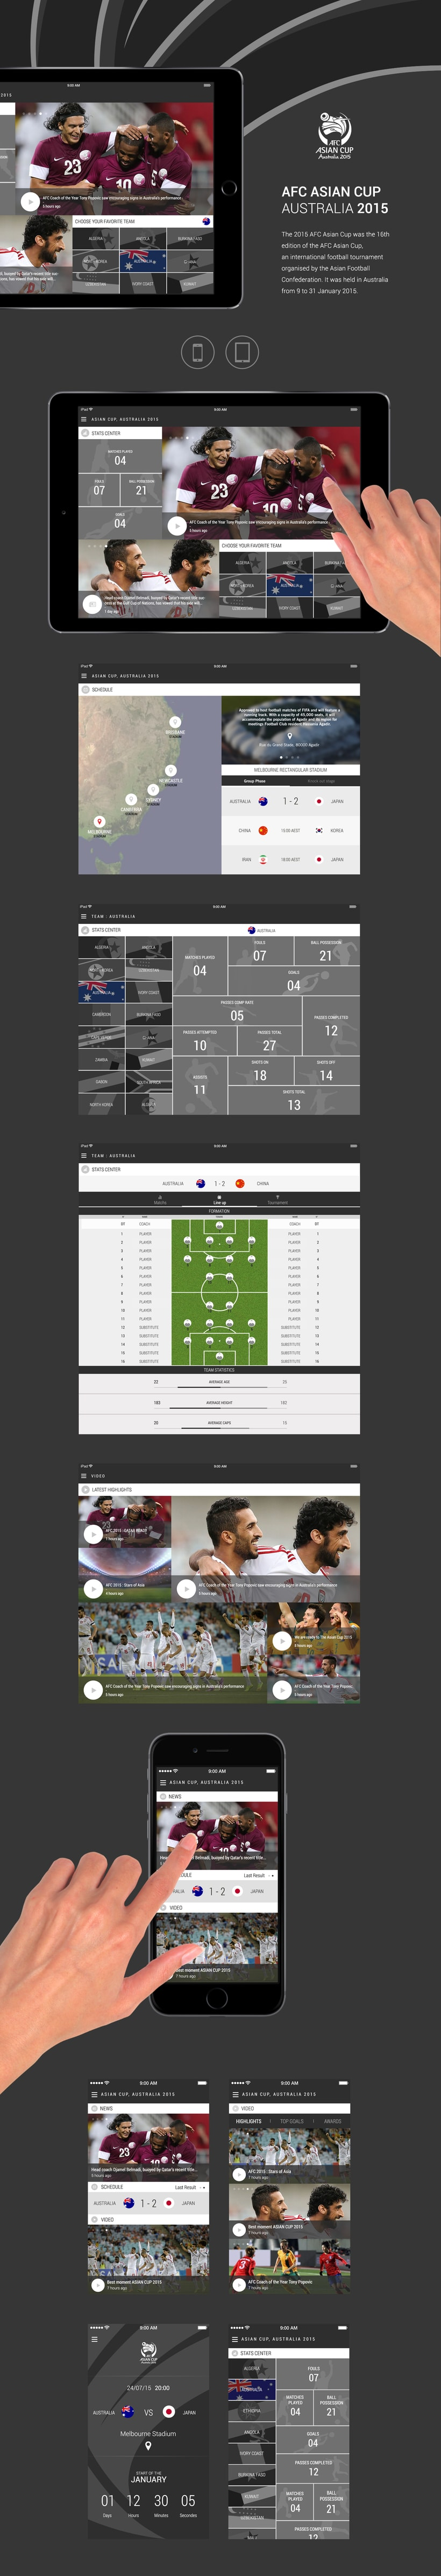 AFC ASIAN CUP AUSTRALIA 2015 0